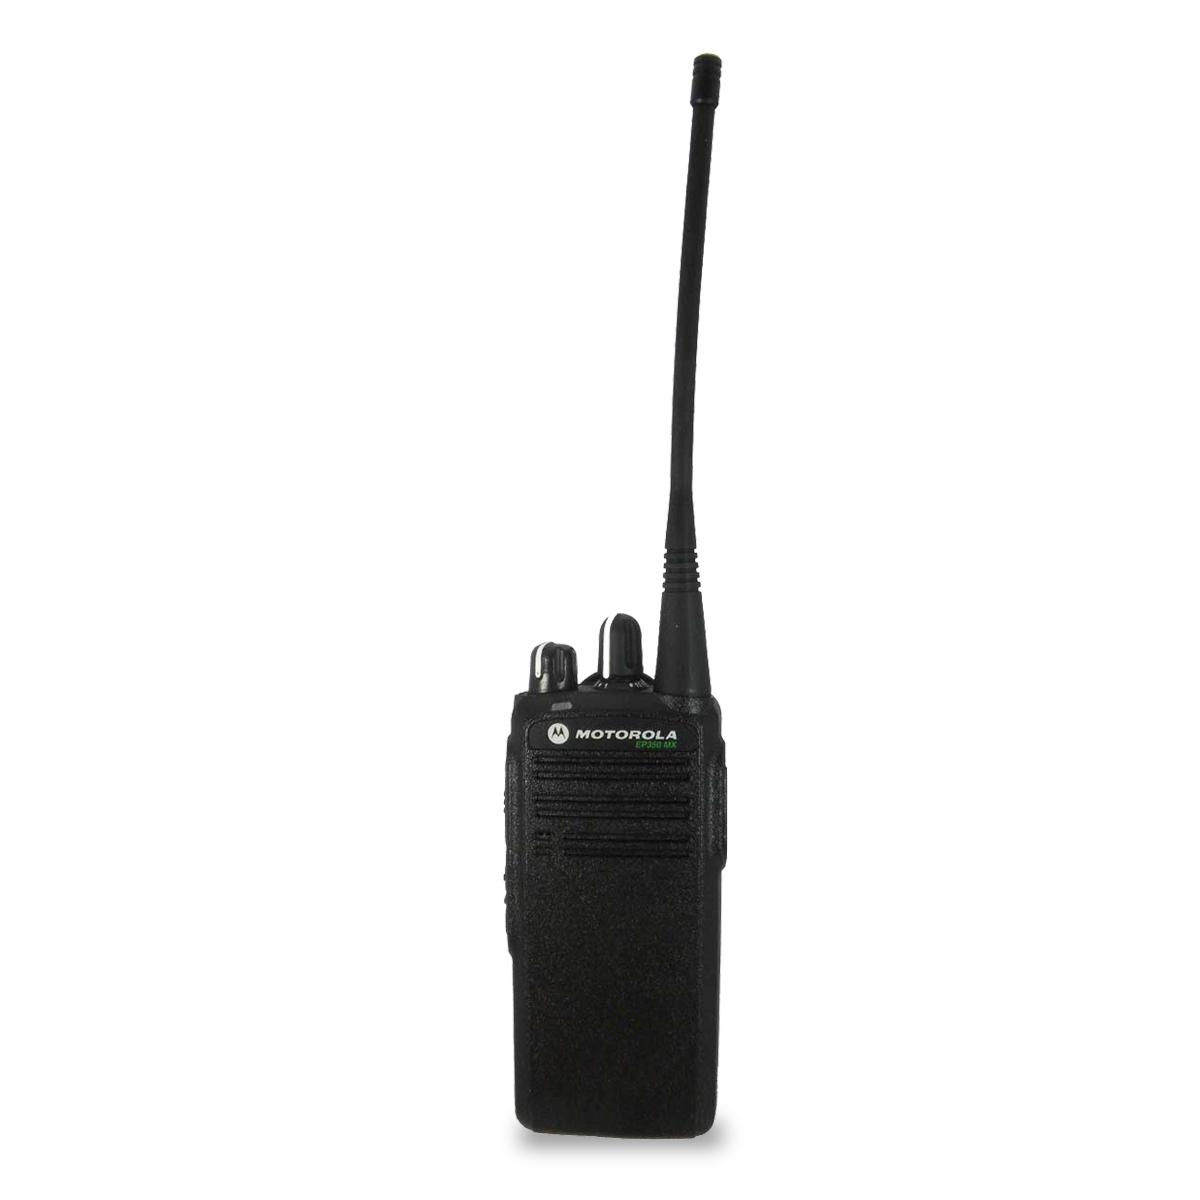 Radio Motorola EP350 MX Analógico LAH03RDC8AB7AN UHF 435-480 MHz sin pantalla y sin teclado